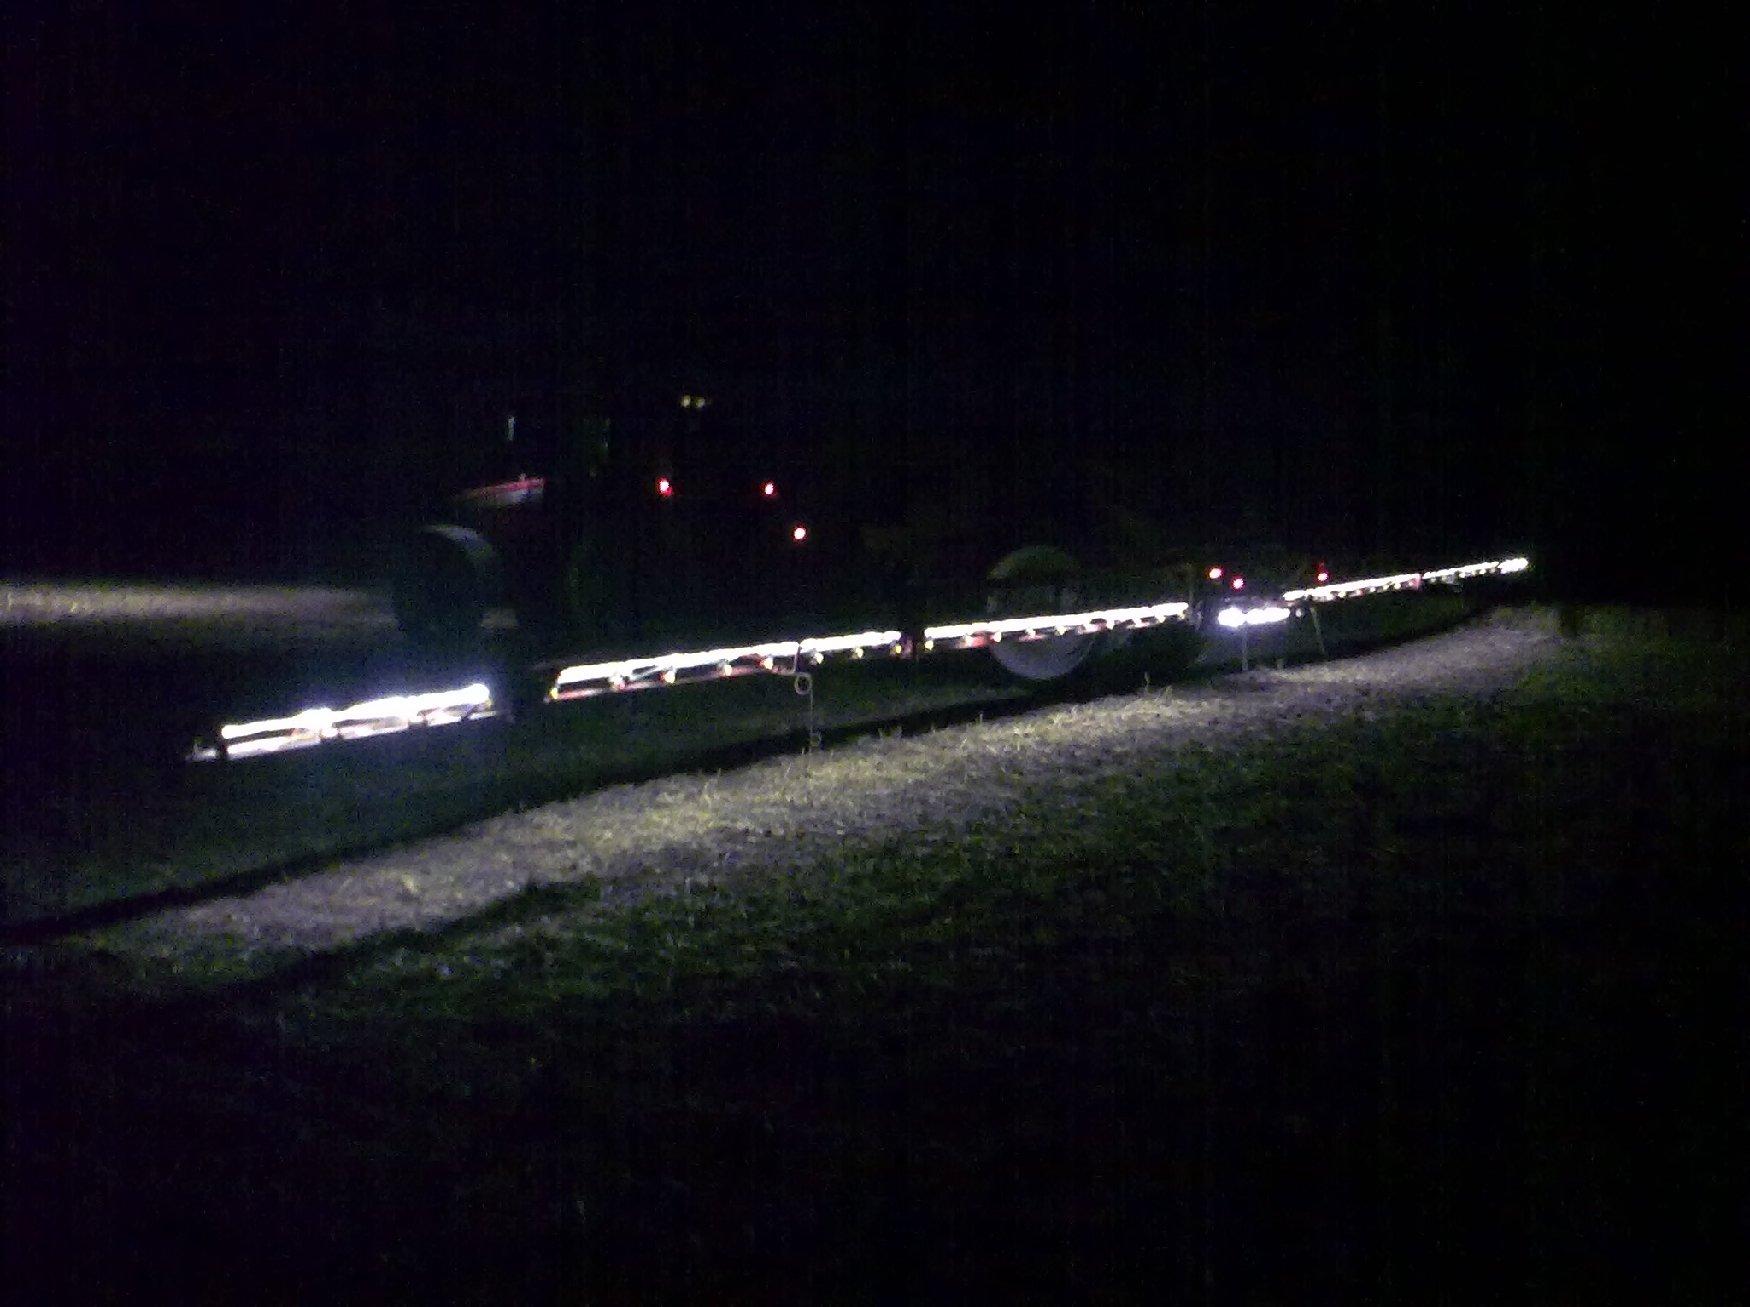 https://www.karmantrading.eu/wp-content/uploads/tractech-sprayer-sproeier-verlichting-led-tractor-straal-2.jpg